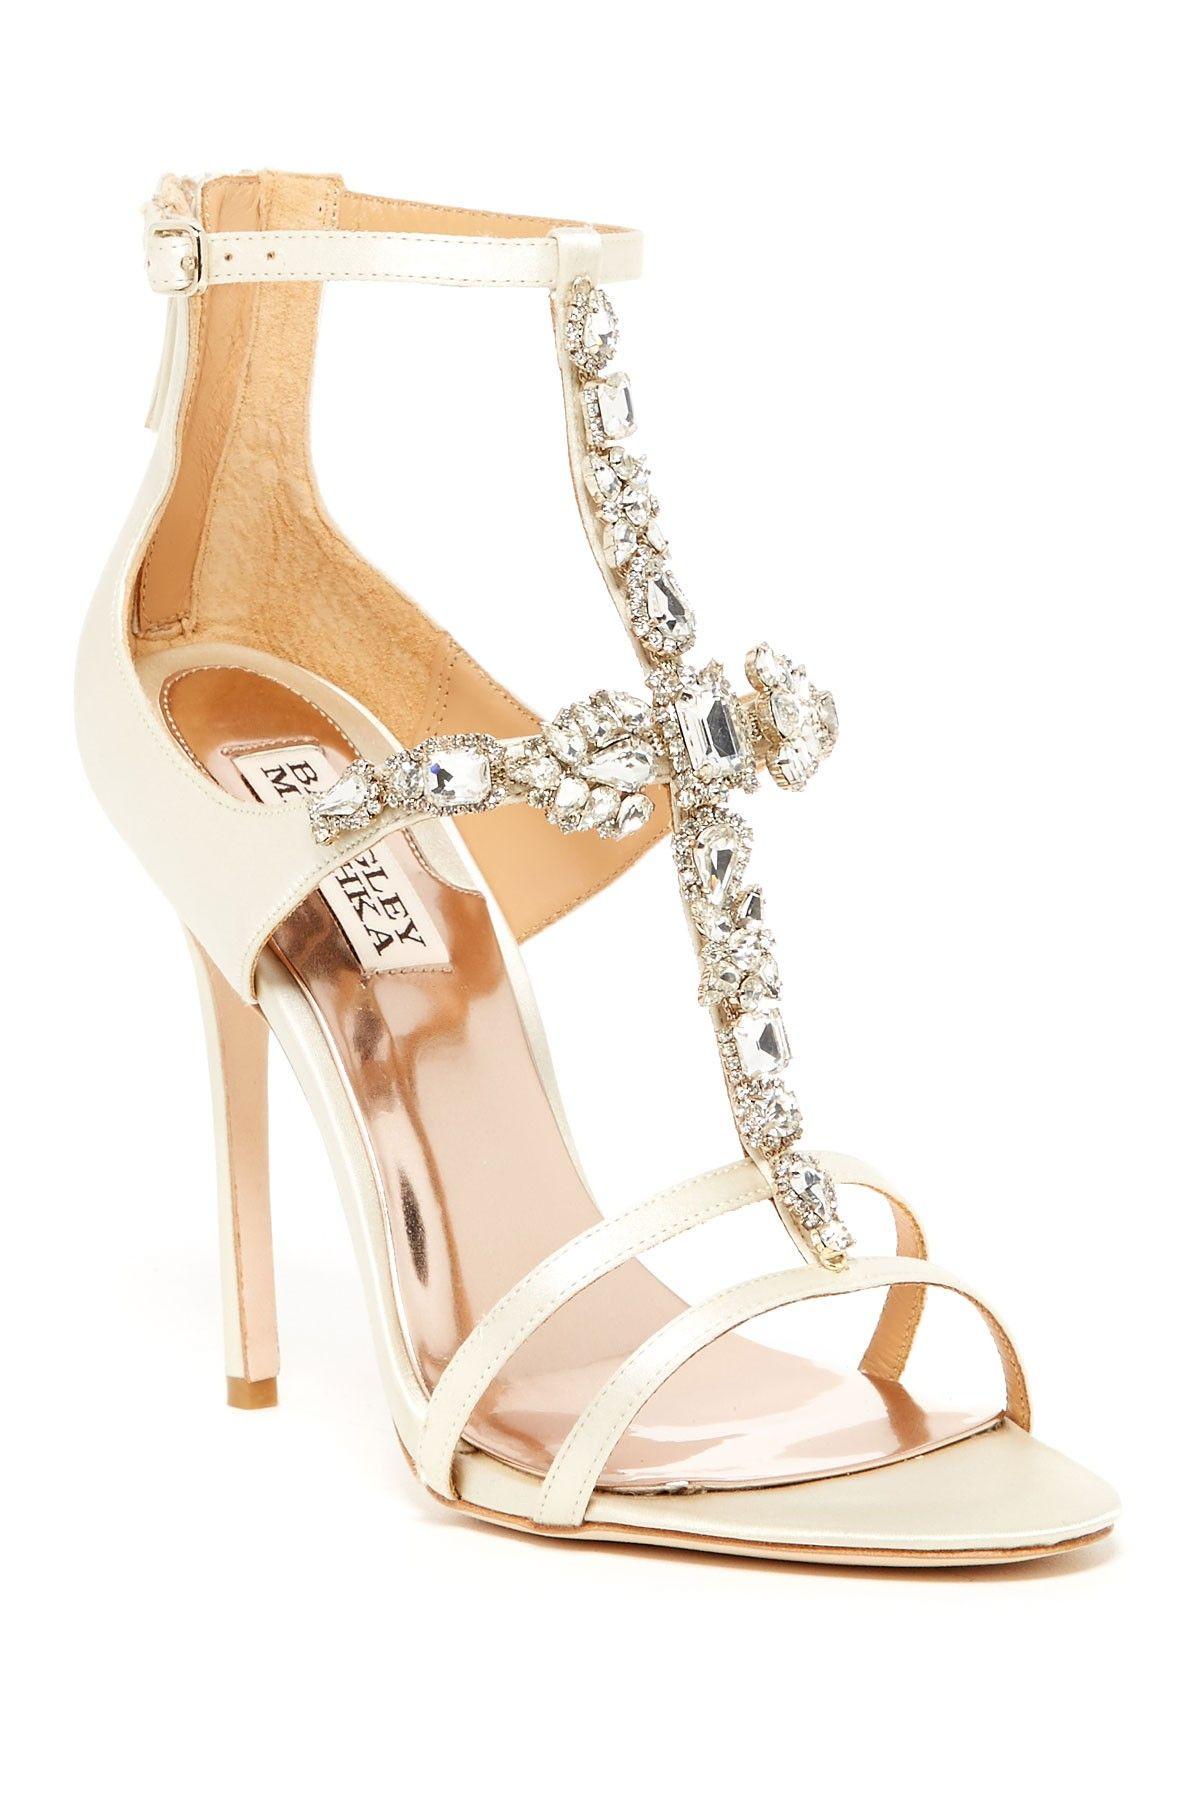 Badgley Mischka Giovanna Dress Sandal Nordstrom Rack